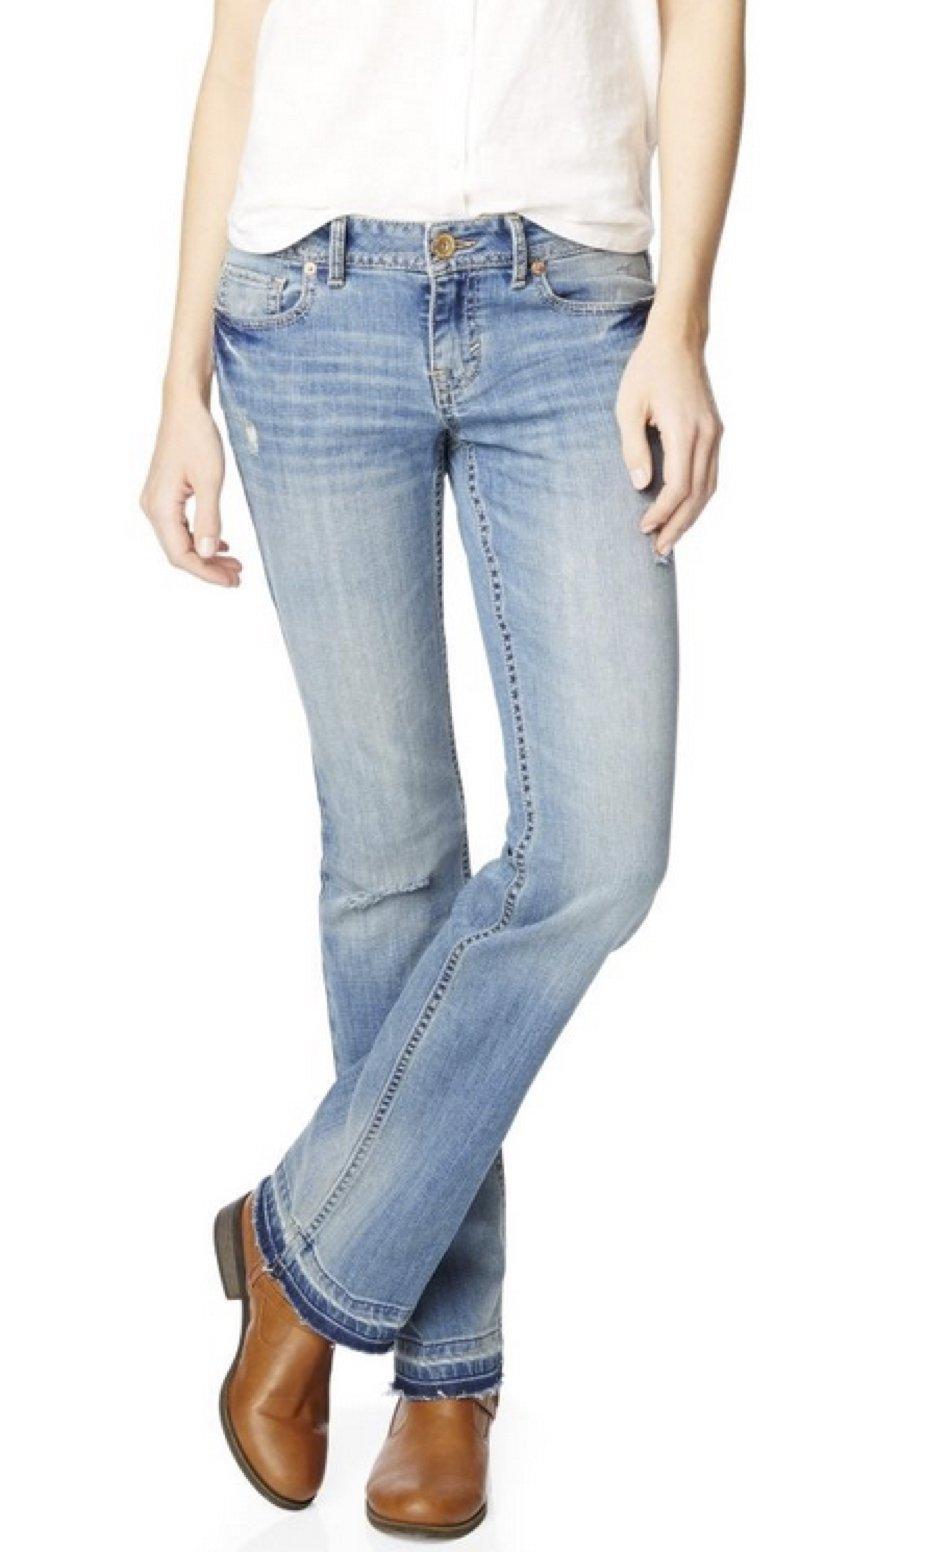 Aeropostale Womens Boot Cut Jeans 0 Regular by Aeropostale